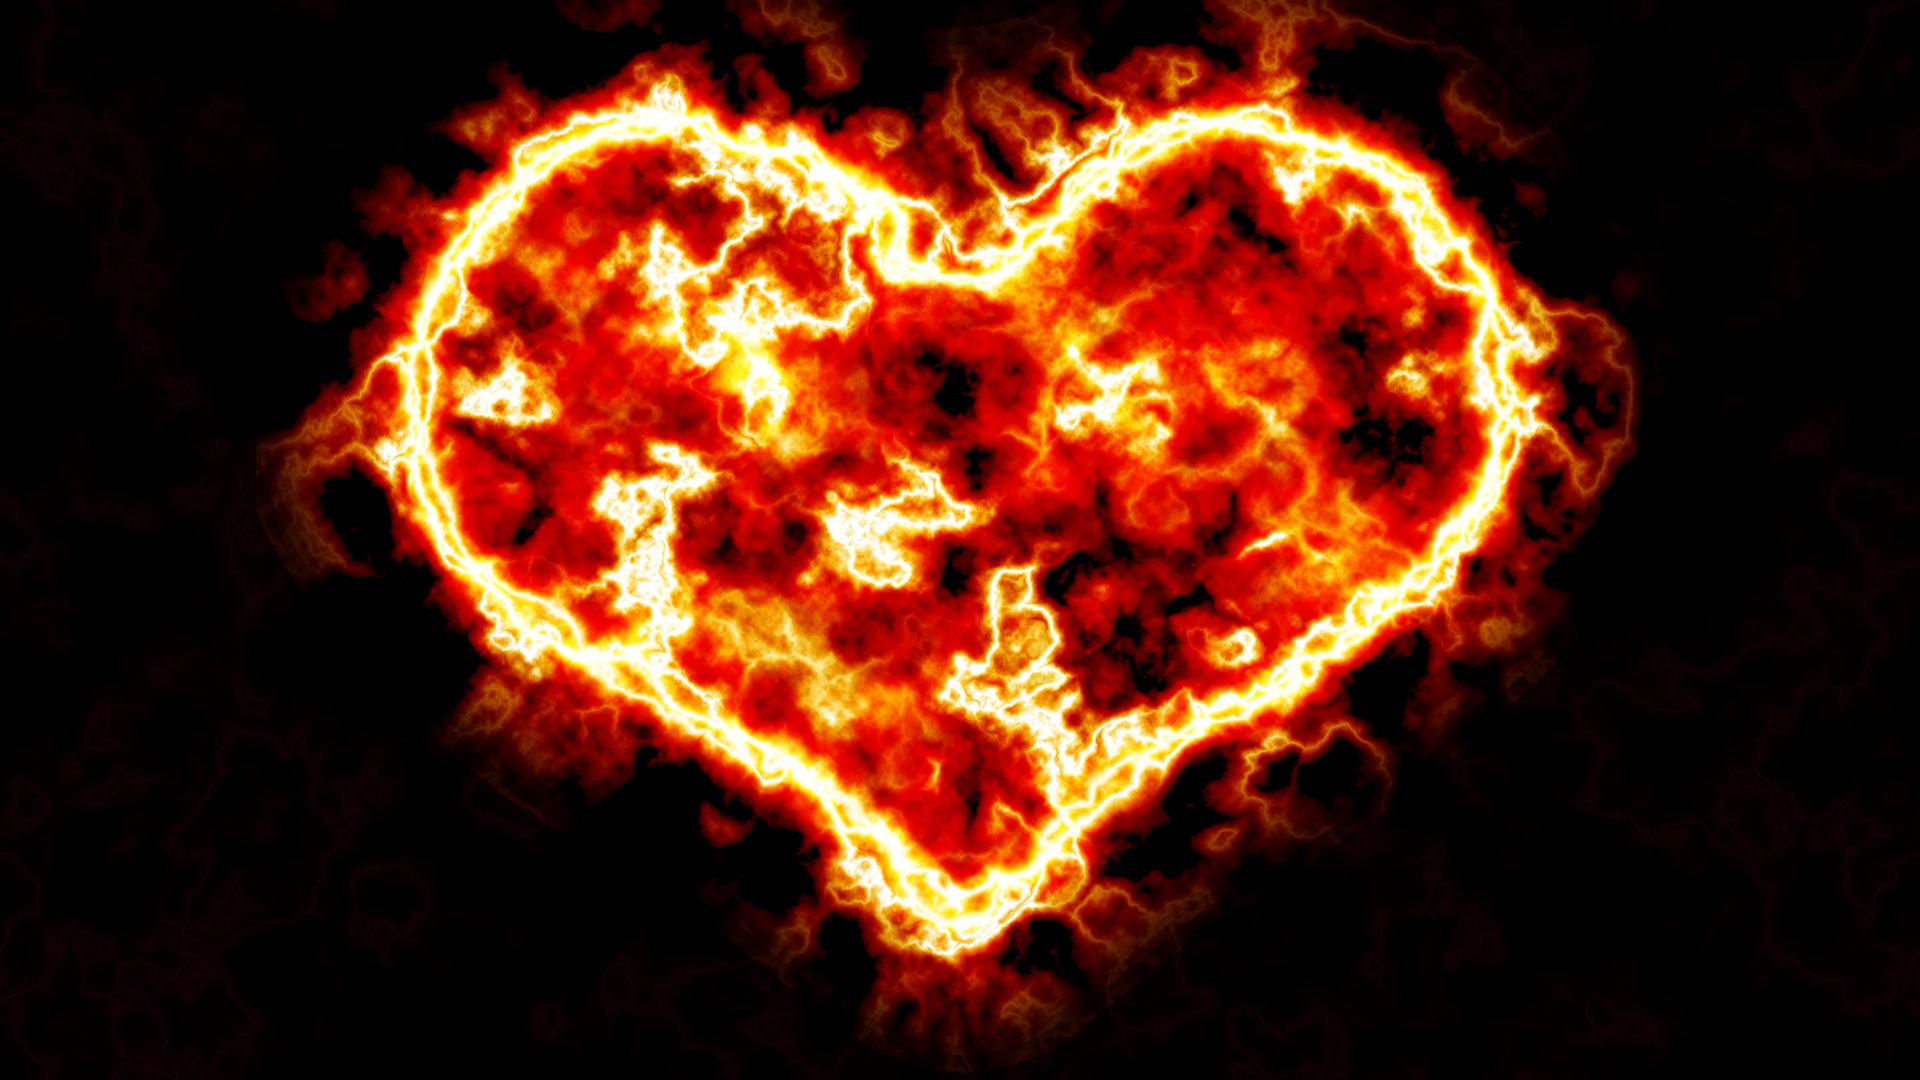 Home Remedies For Severe Acid Burn